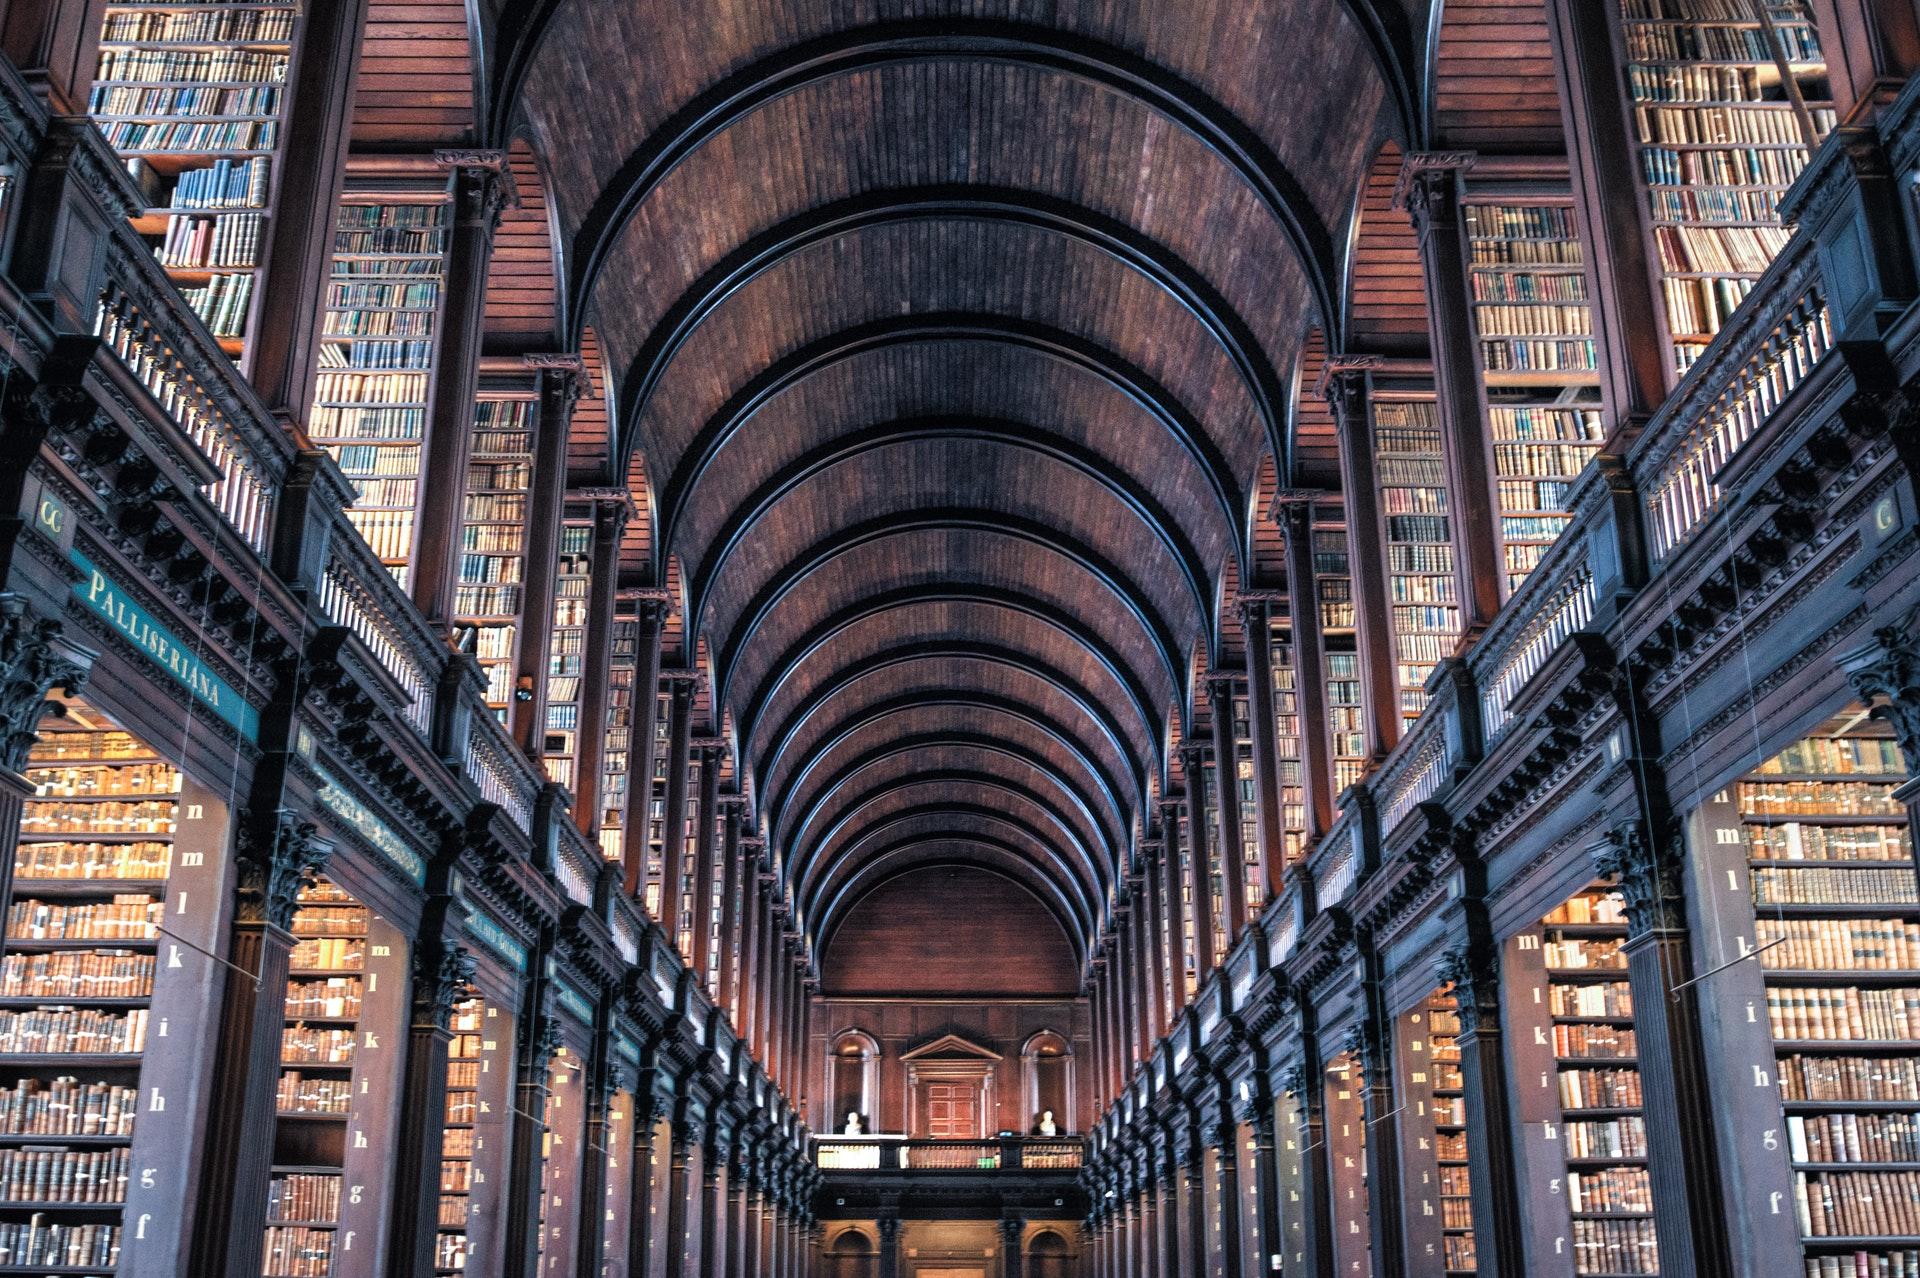 books-shelves-architecture-wood-442420.jpeg